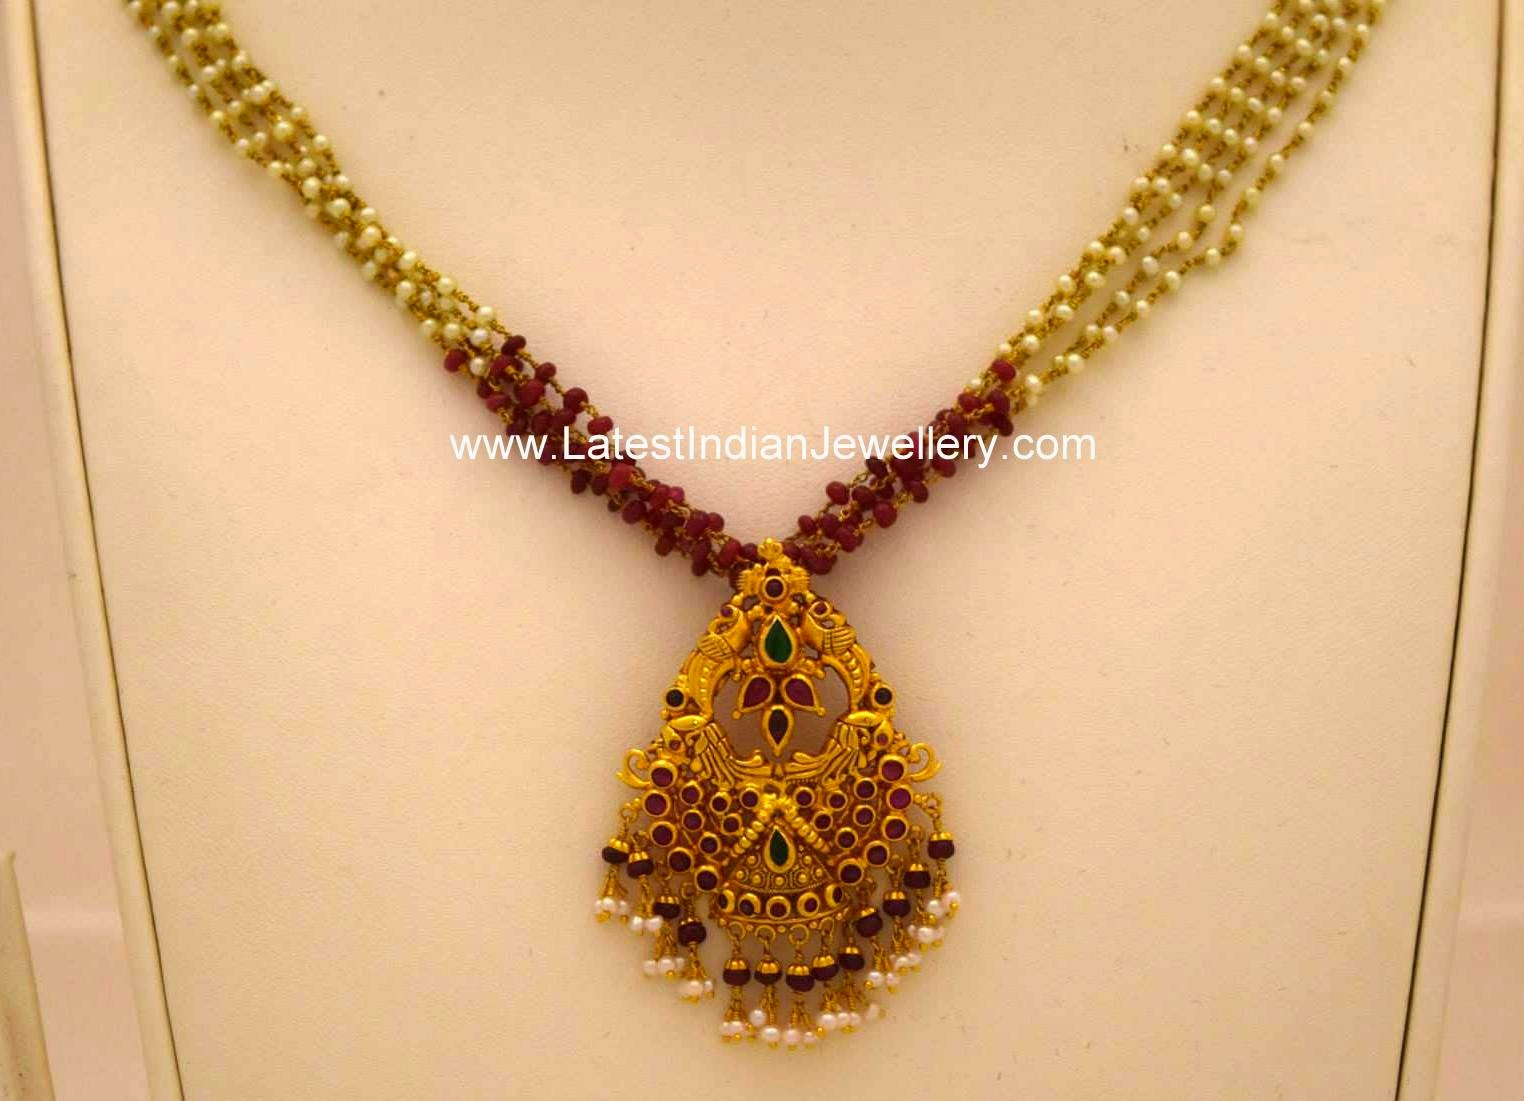 Light Weight Beads Chain Gold Pendant